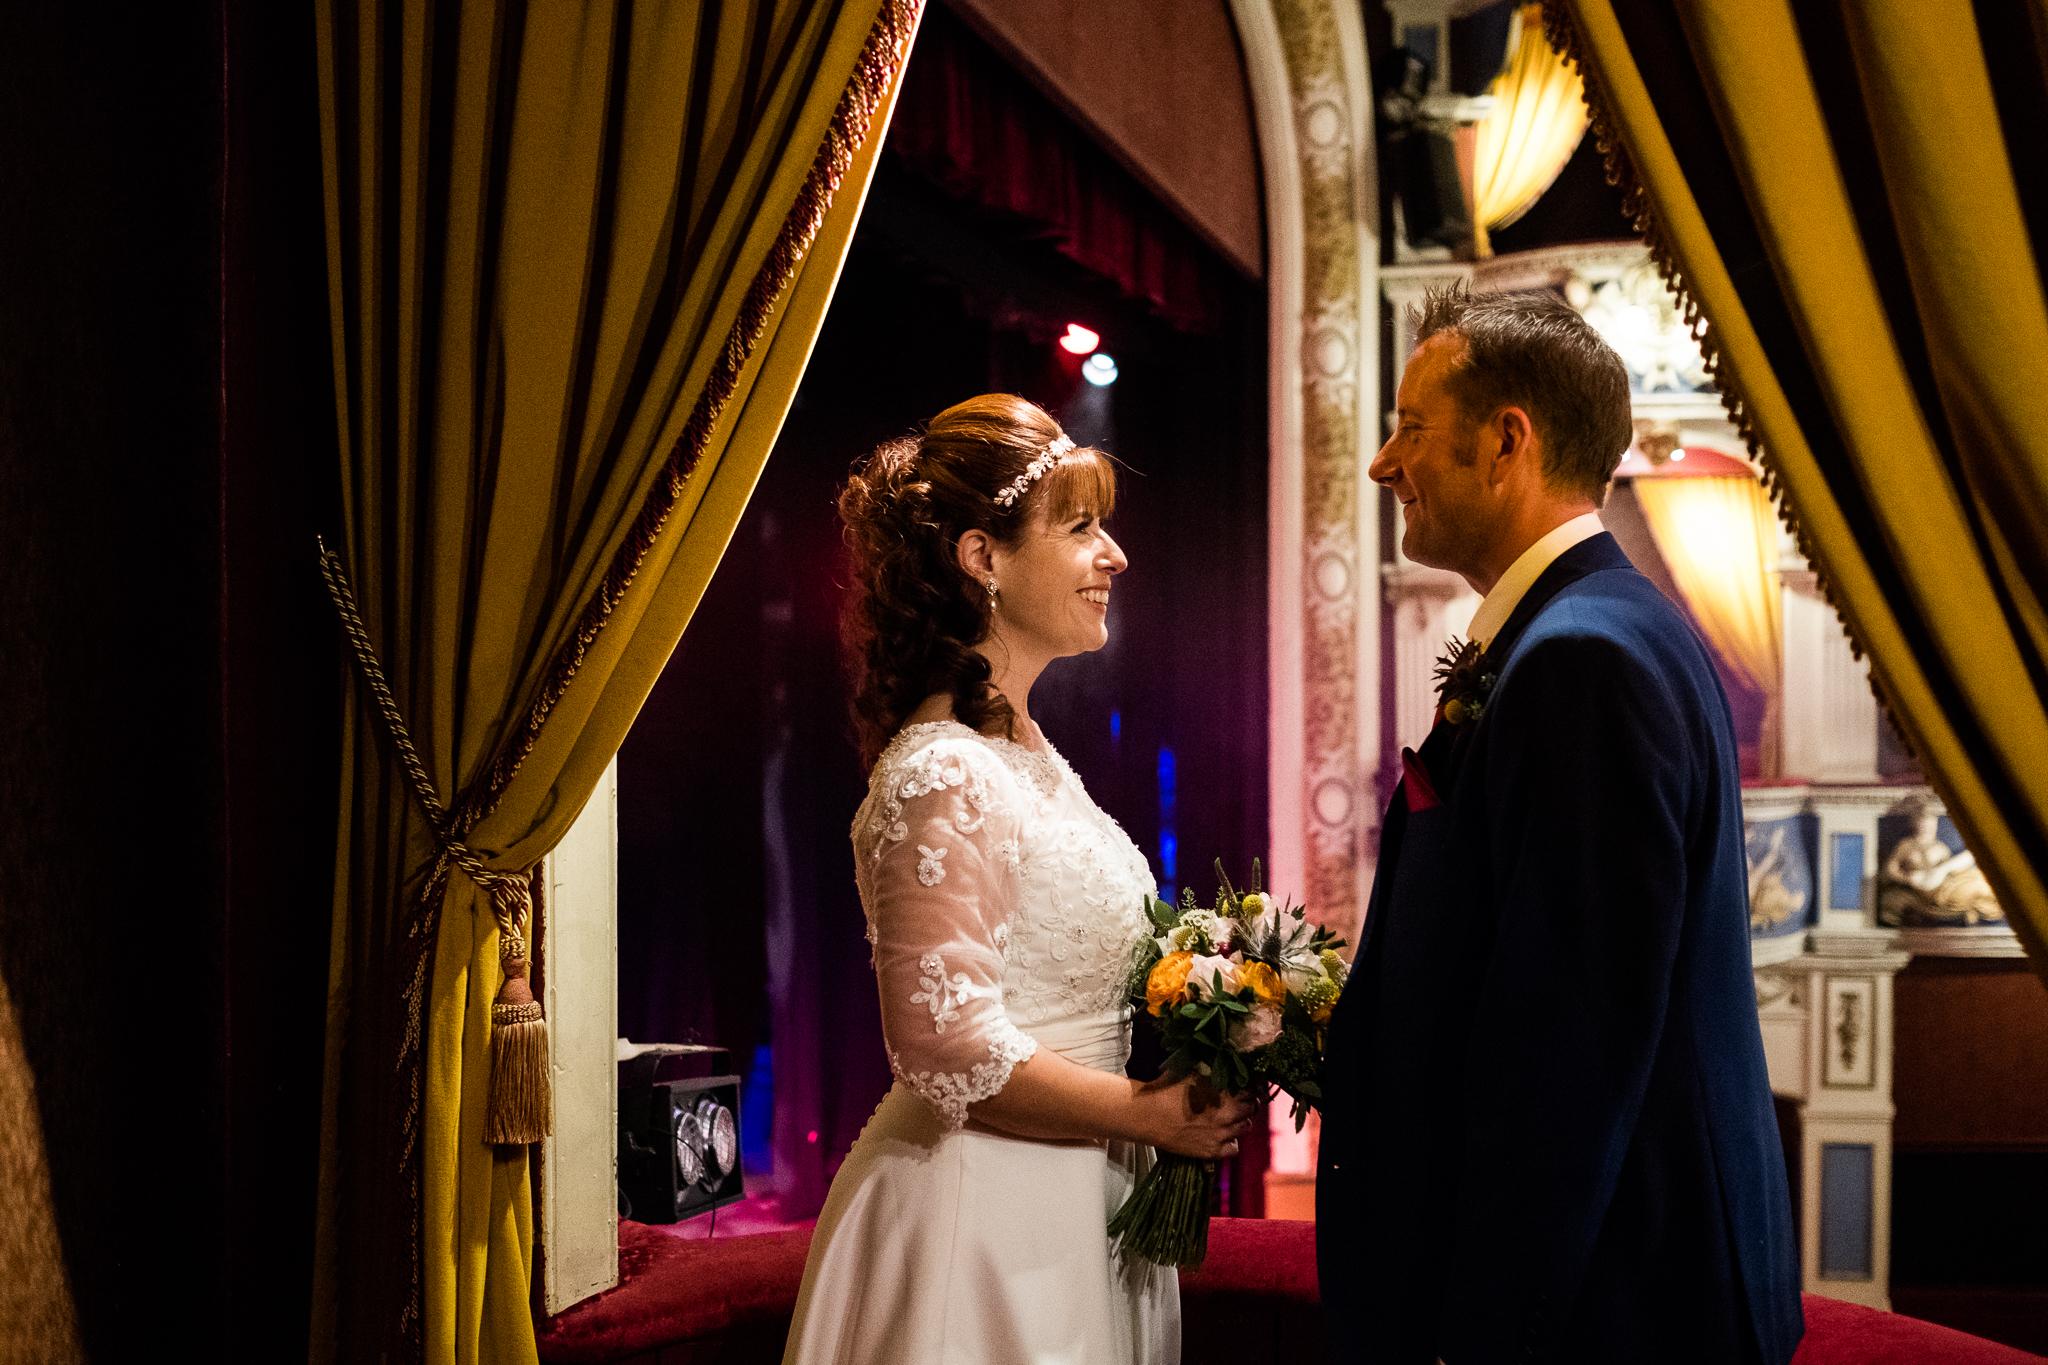 Cheshire Wedding Photography at Crewe Lyceum Theatre Stage Wedding Art Deco 20s - Jenny Harper-32.jpg